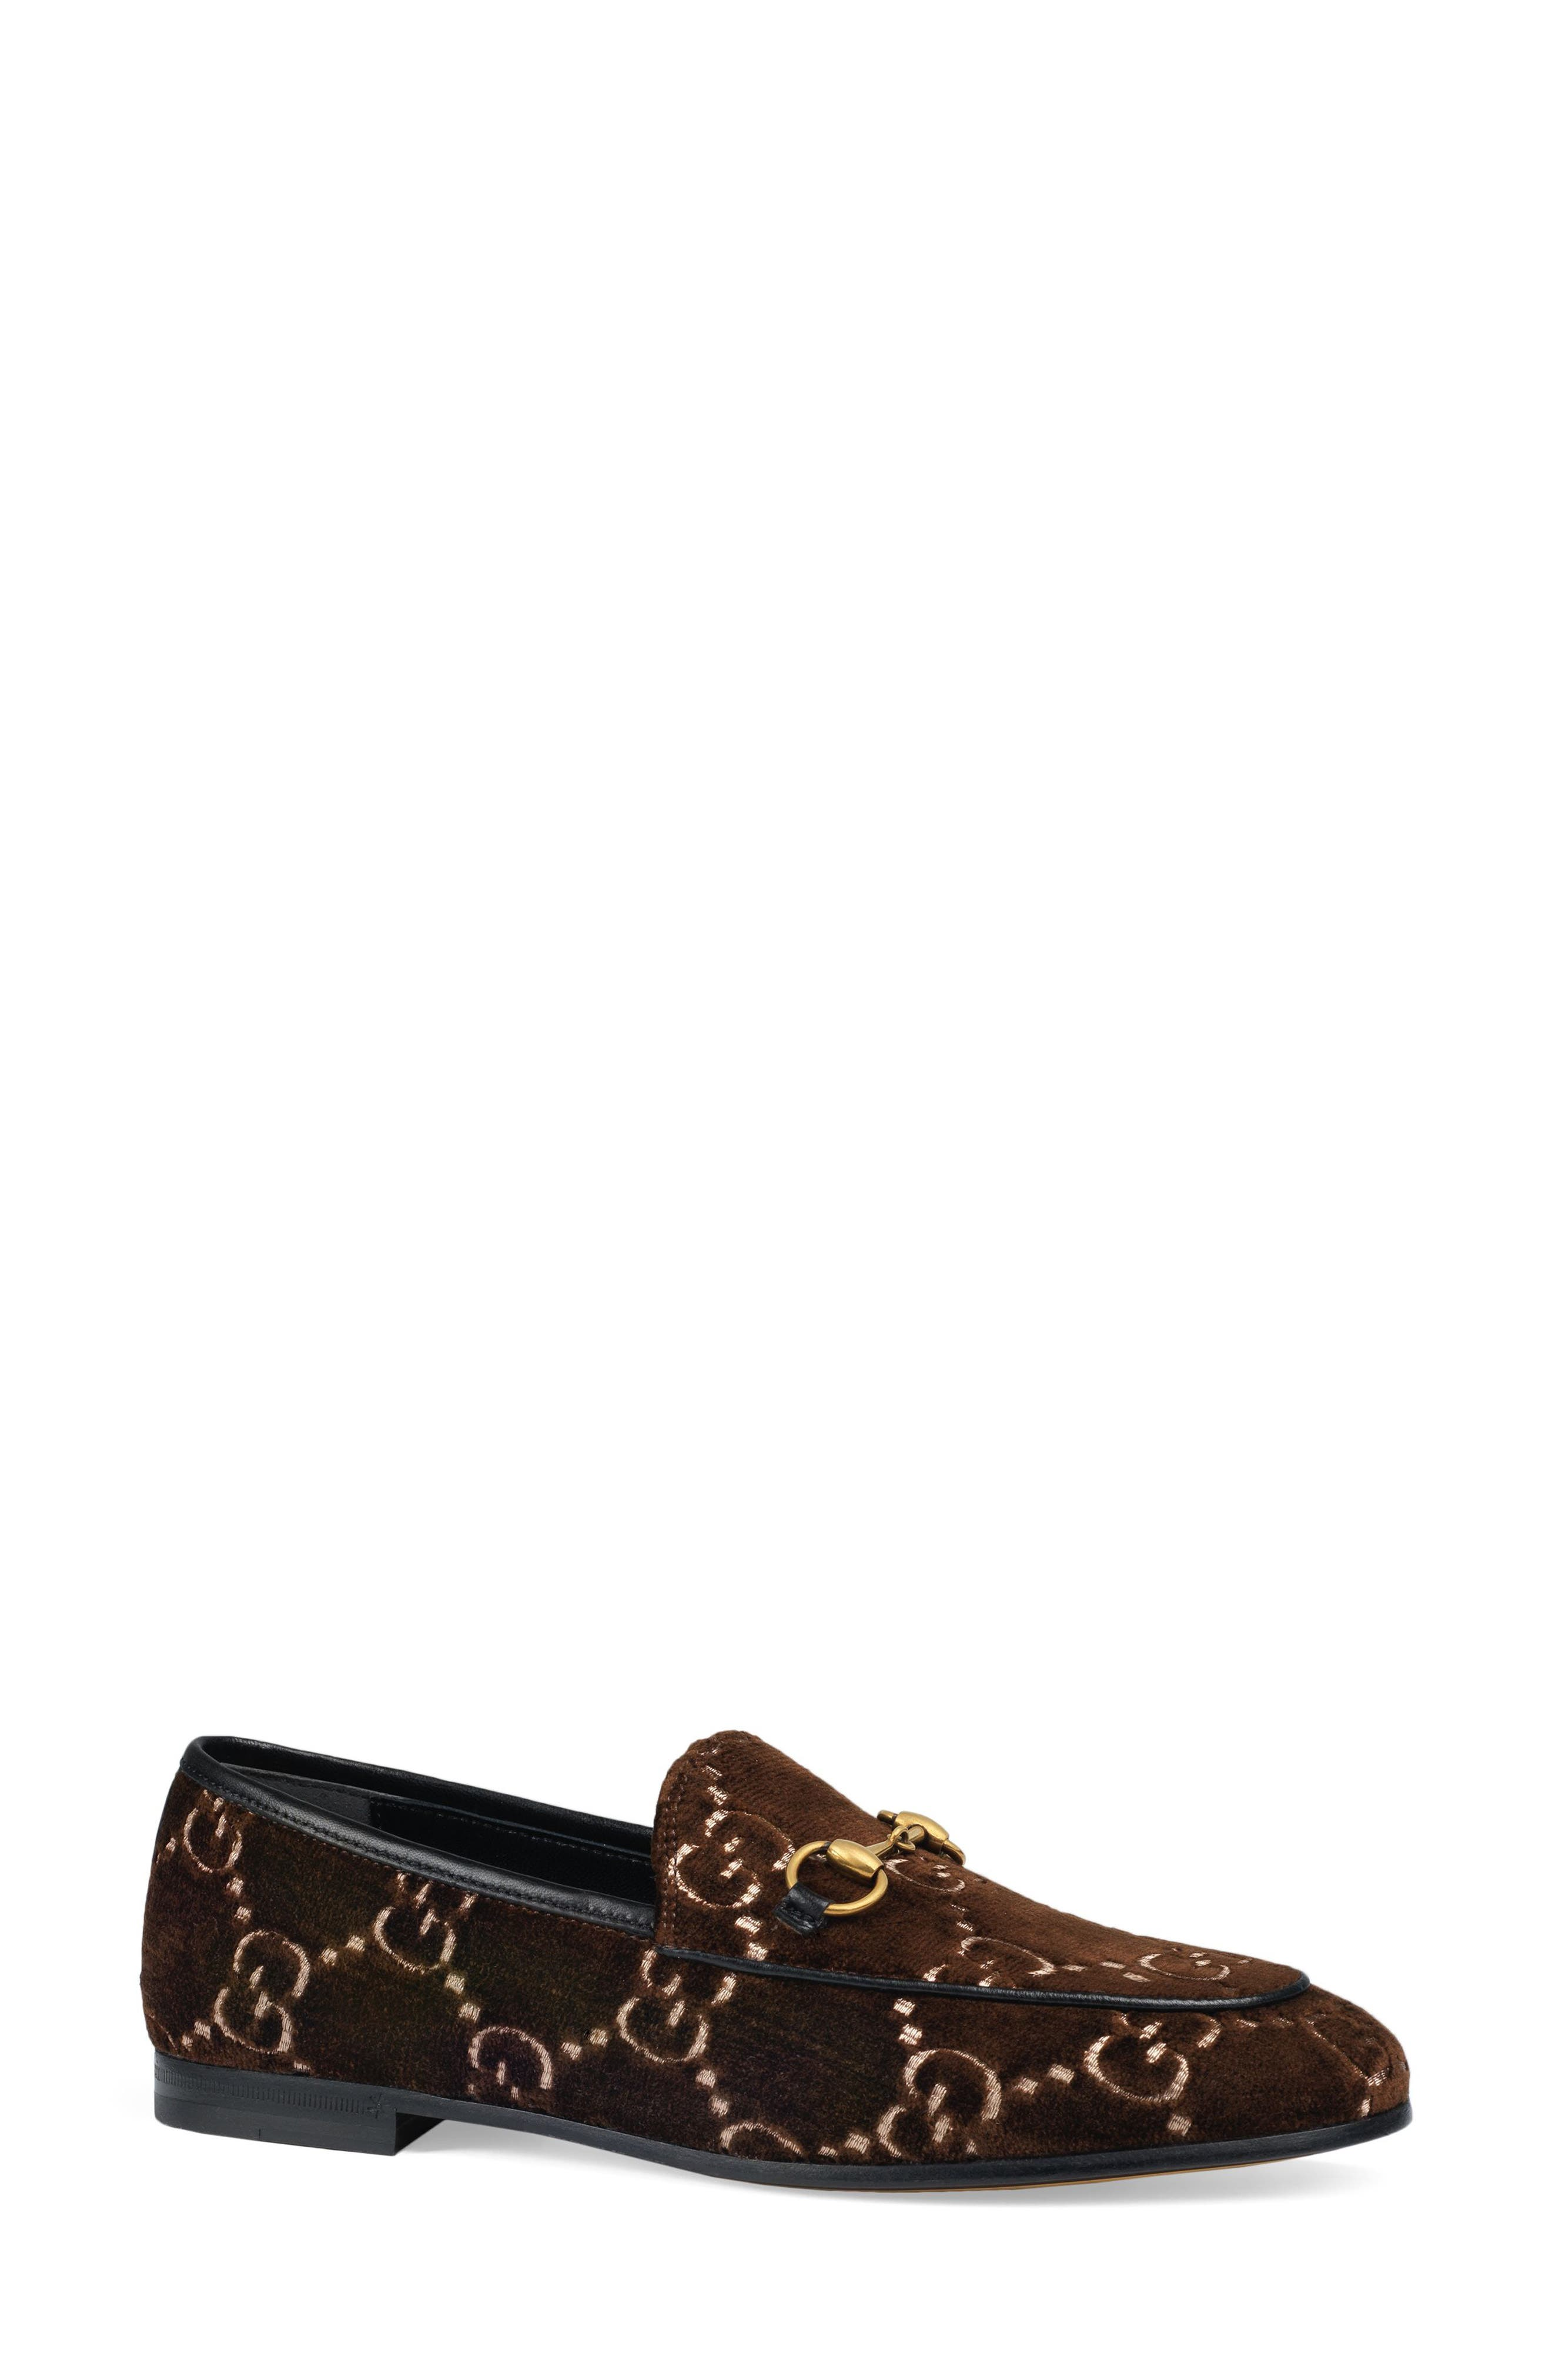 Alternate Image 1 Selected - Gucci Jordaan Loafer (Women)